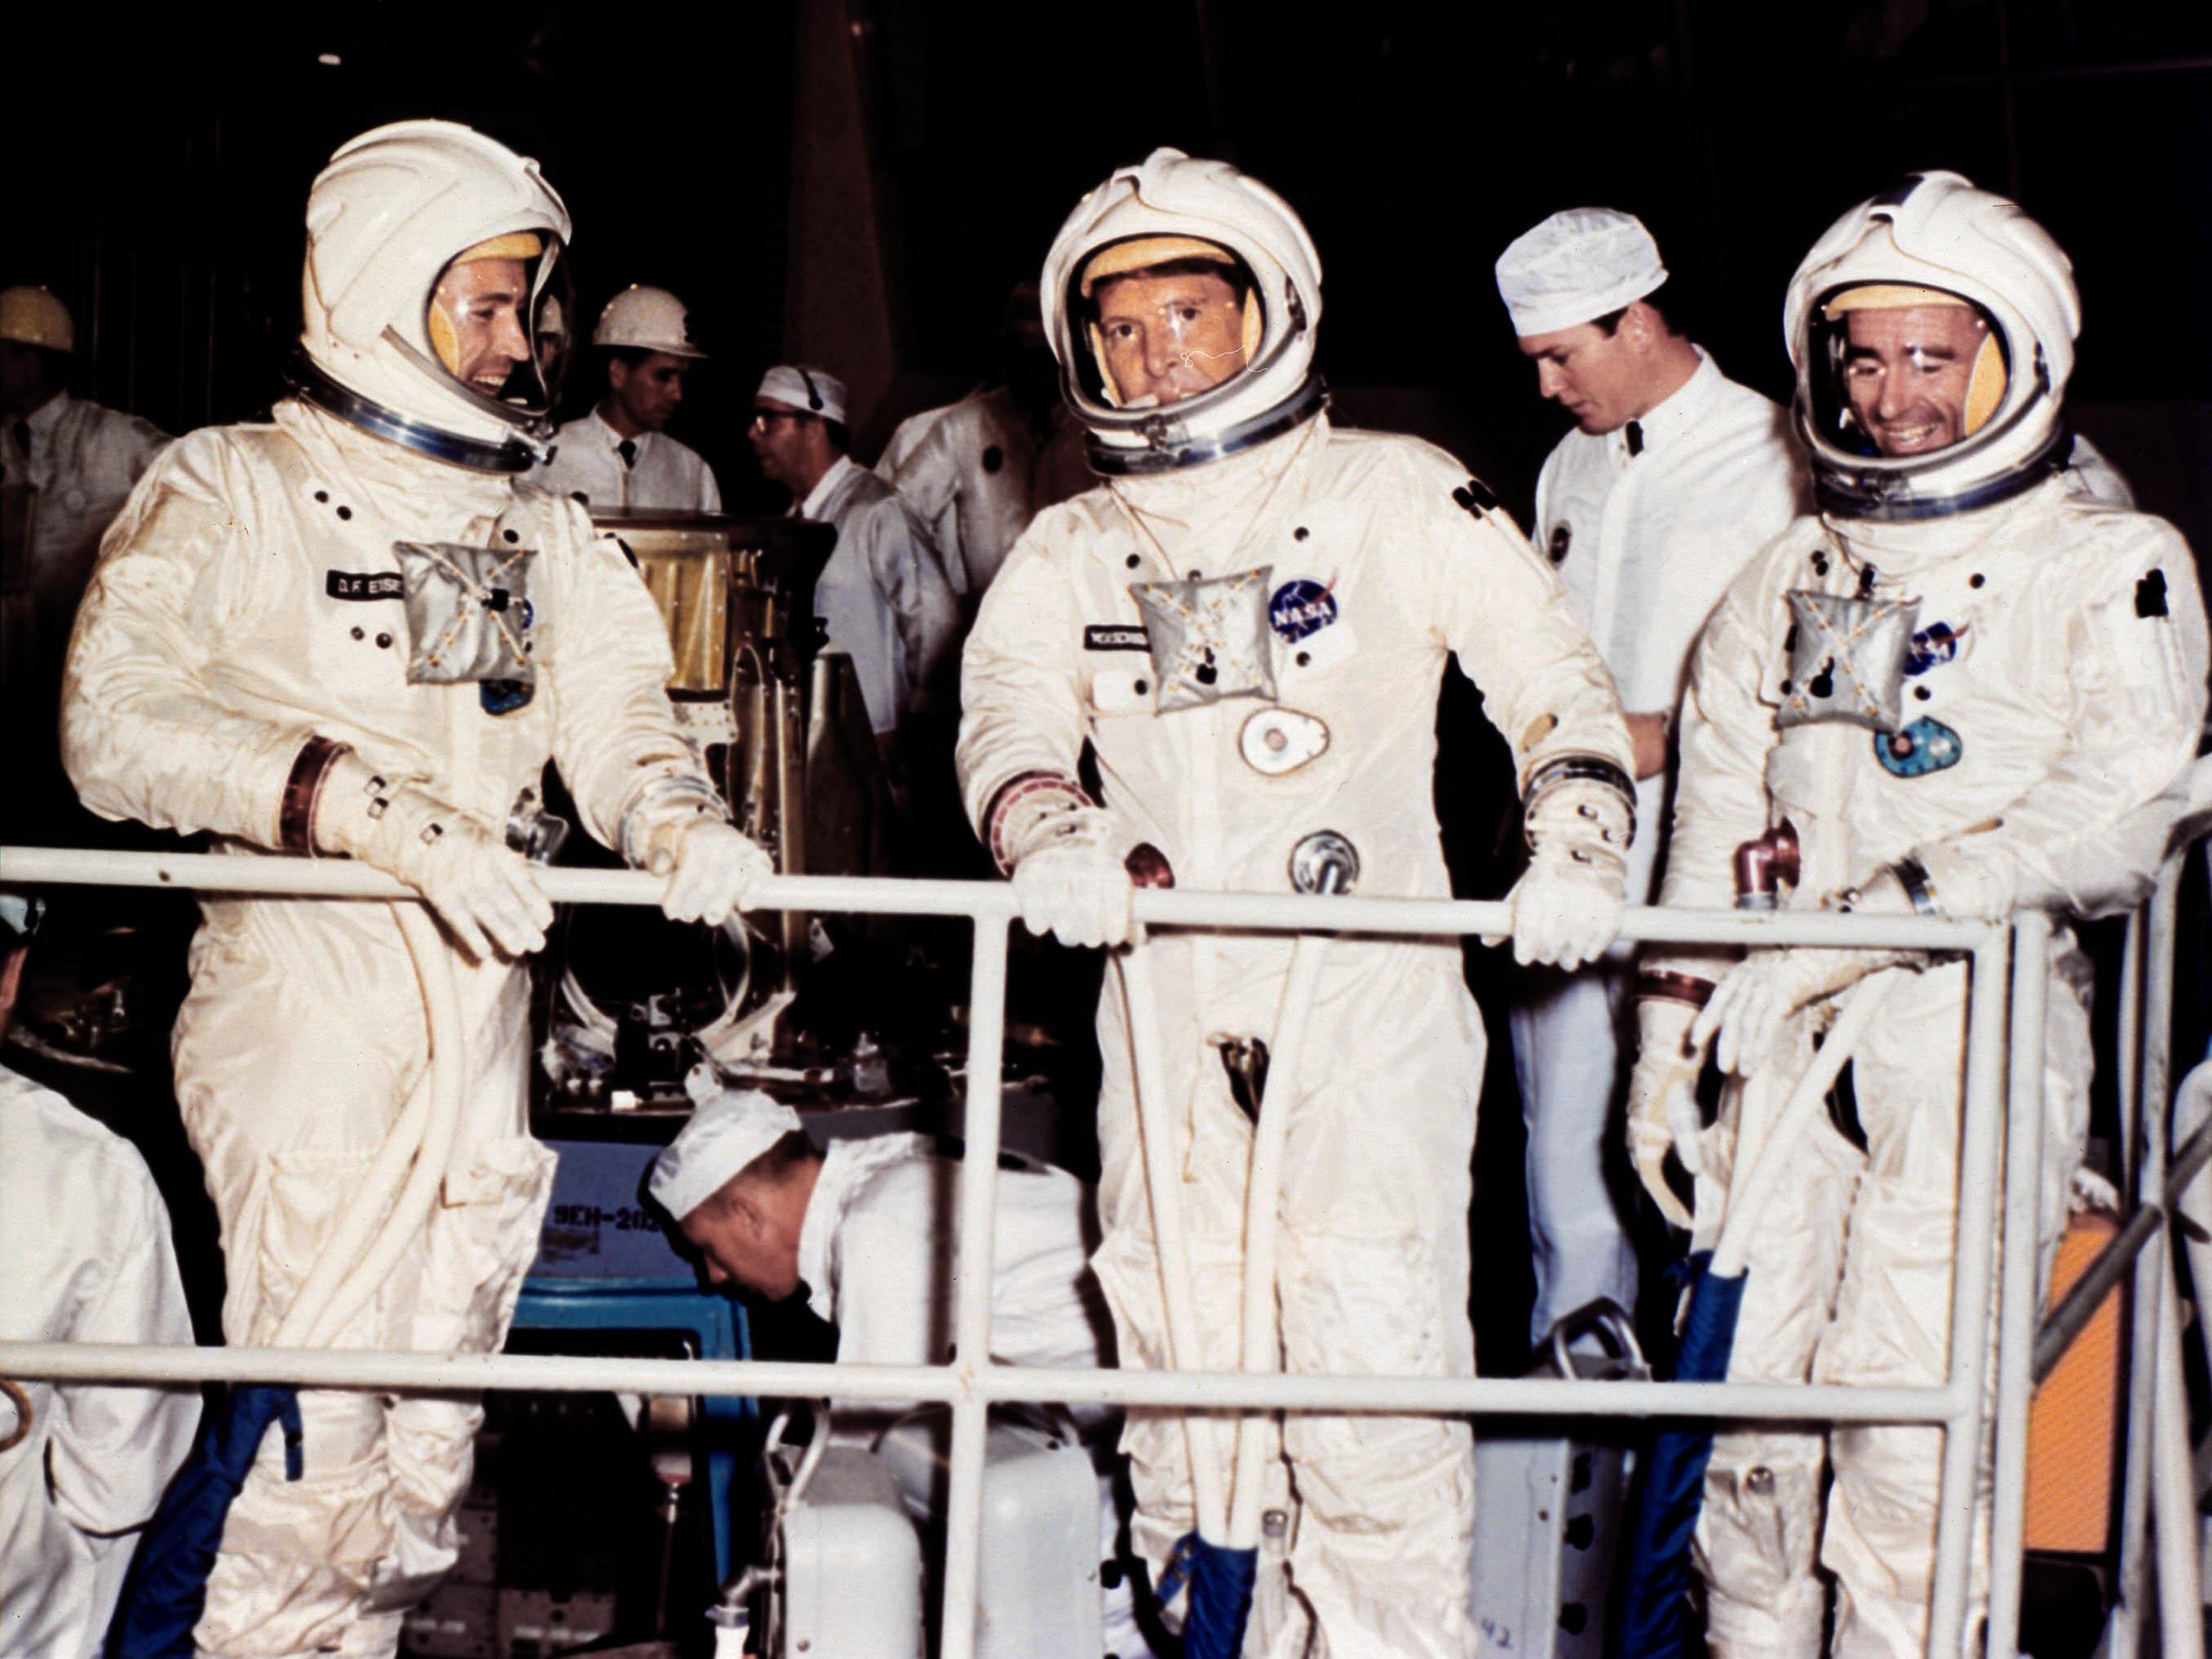 apollo space missions crews - photo #11